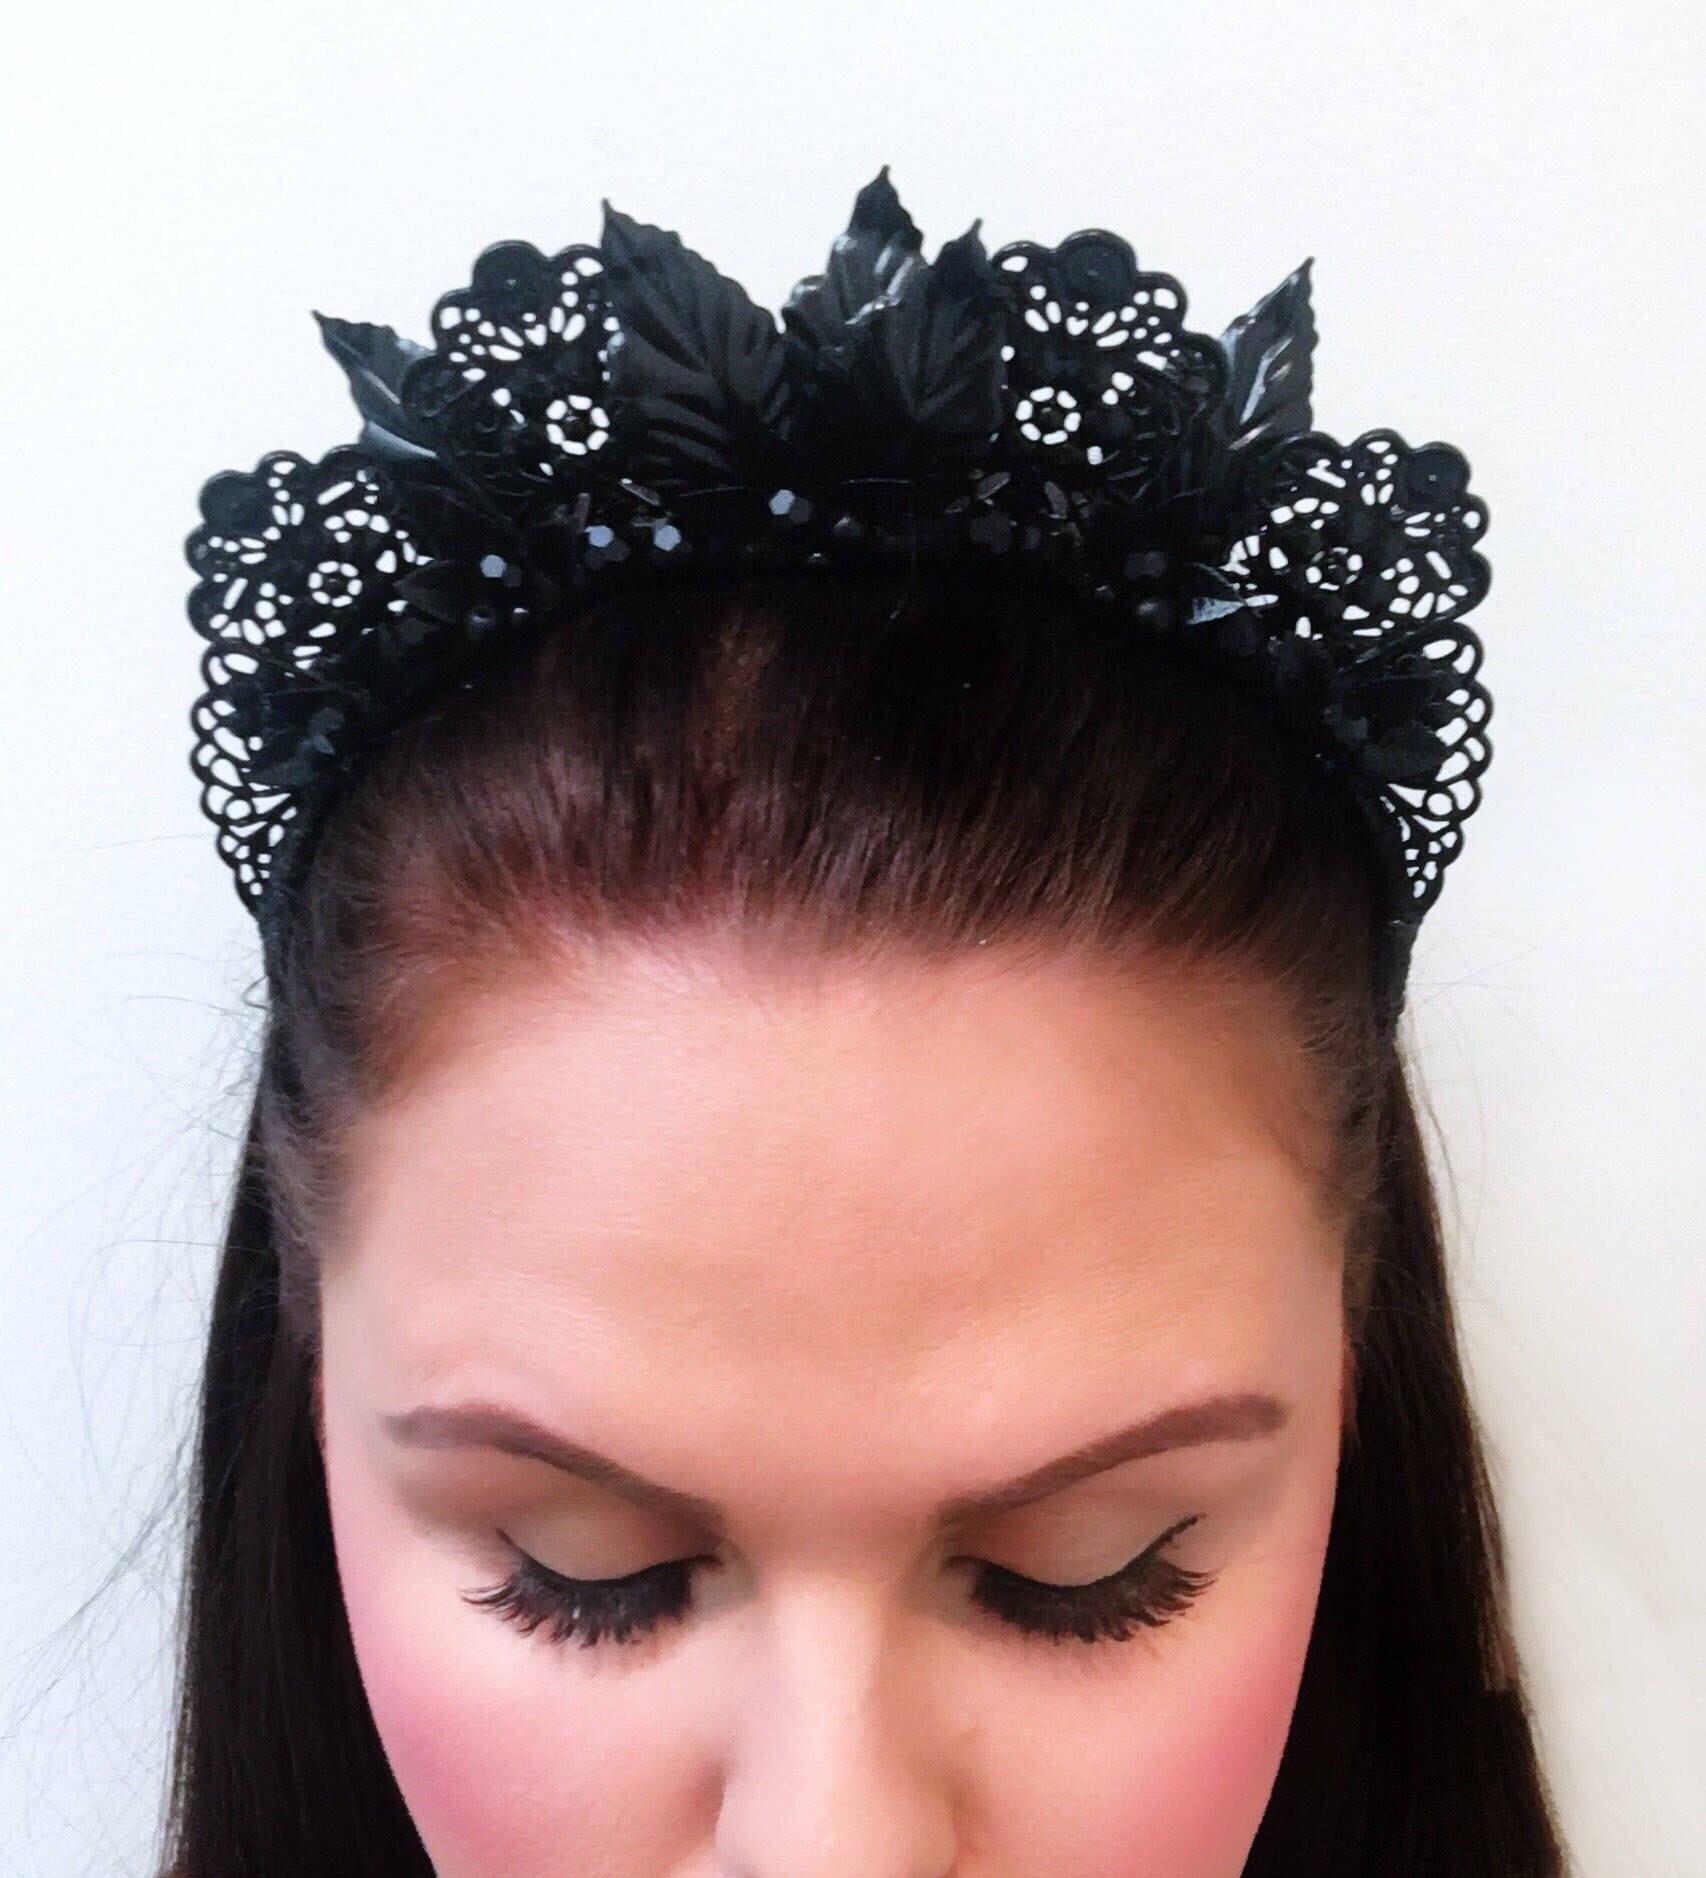 Matte black floral crown black crown flower crown flowers metal matte black floral crown black crown flower crown flowers metal crown izmirmasajfo